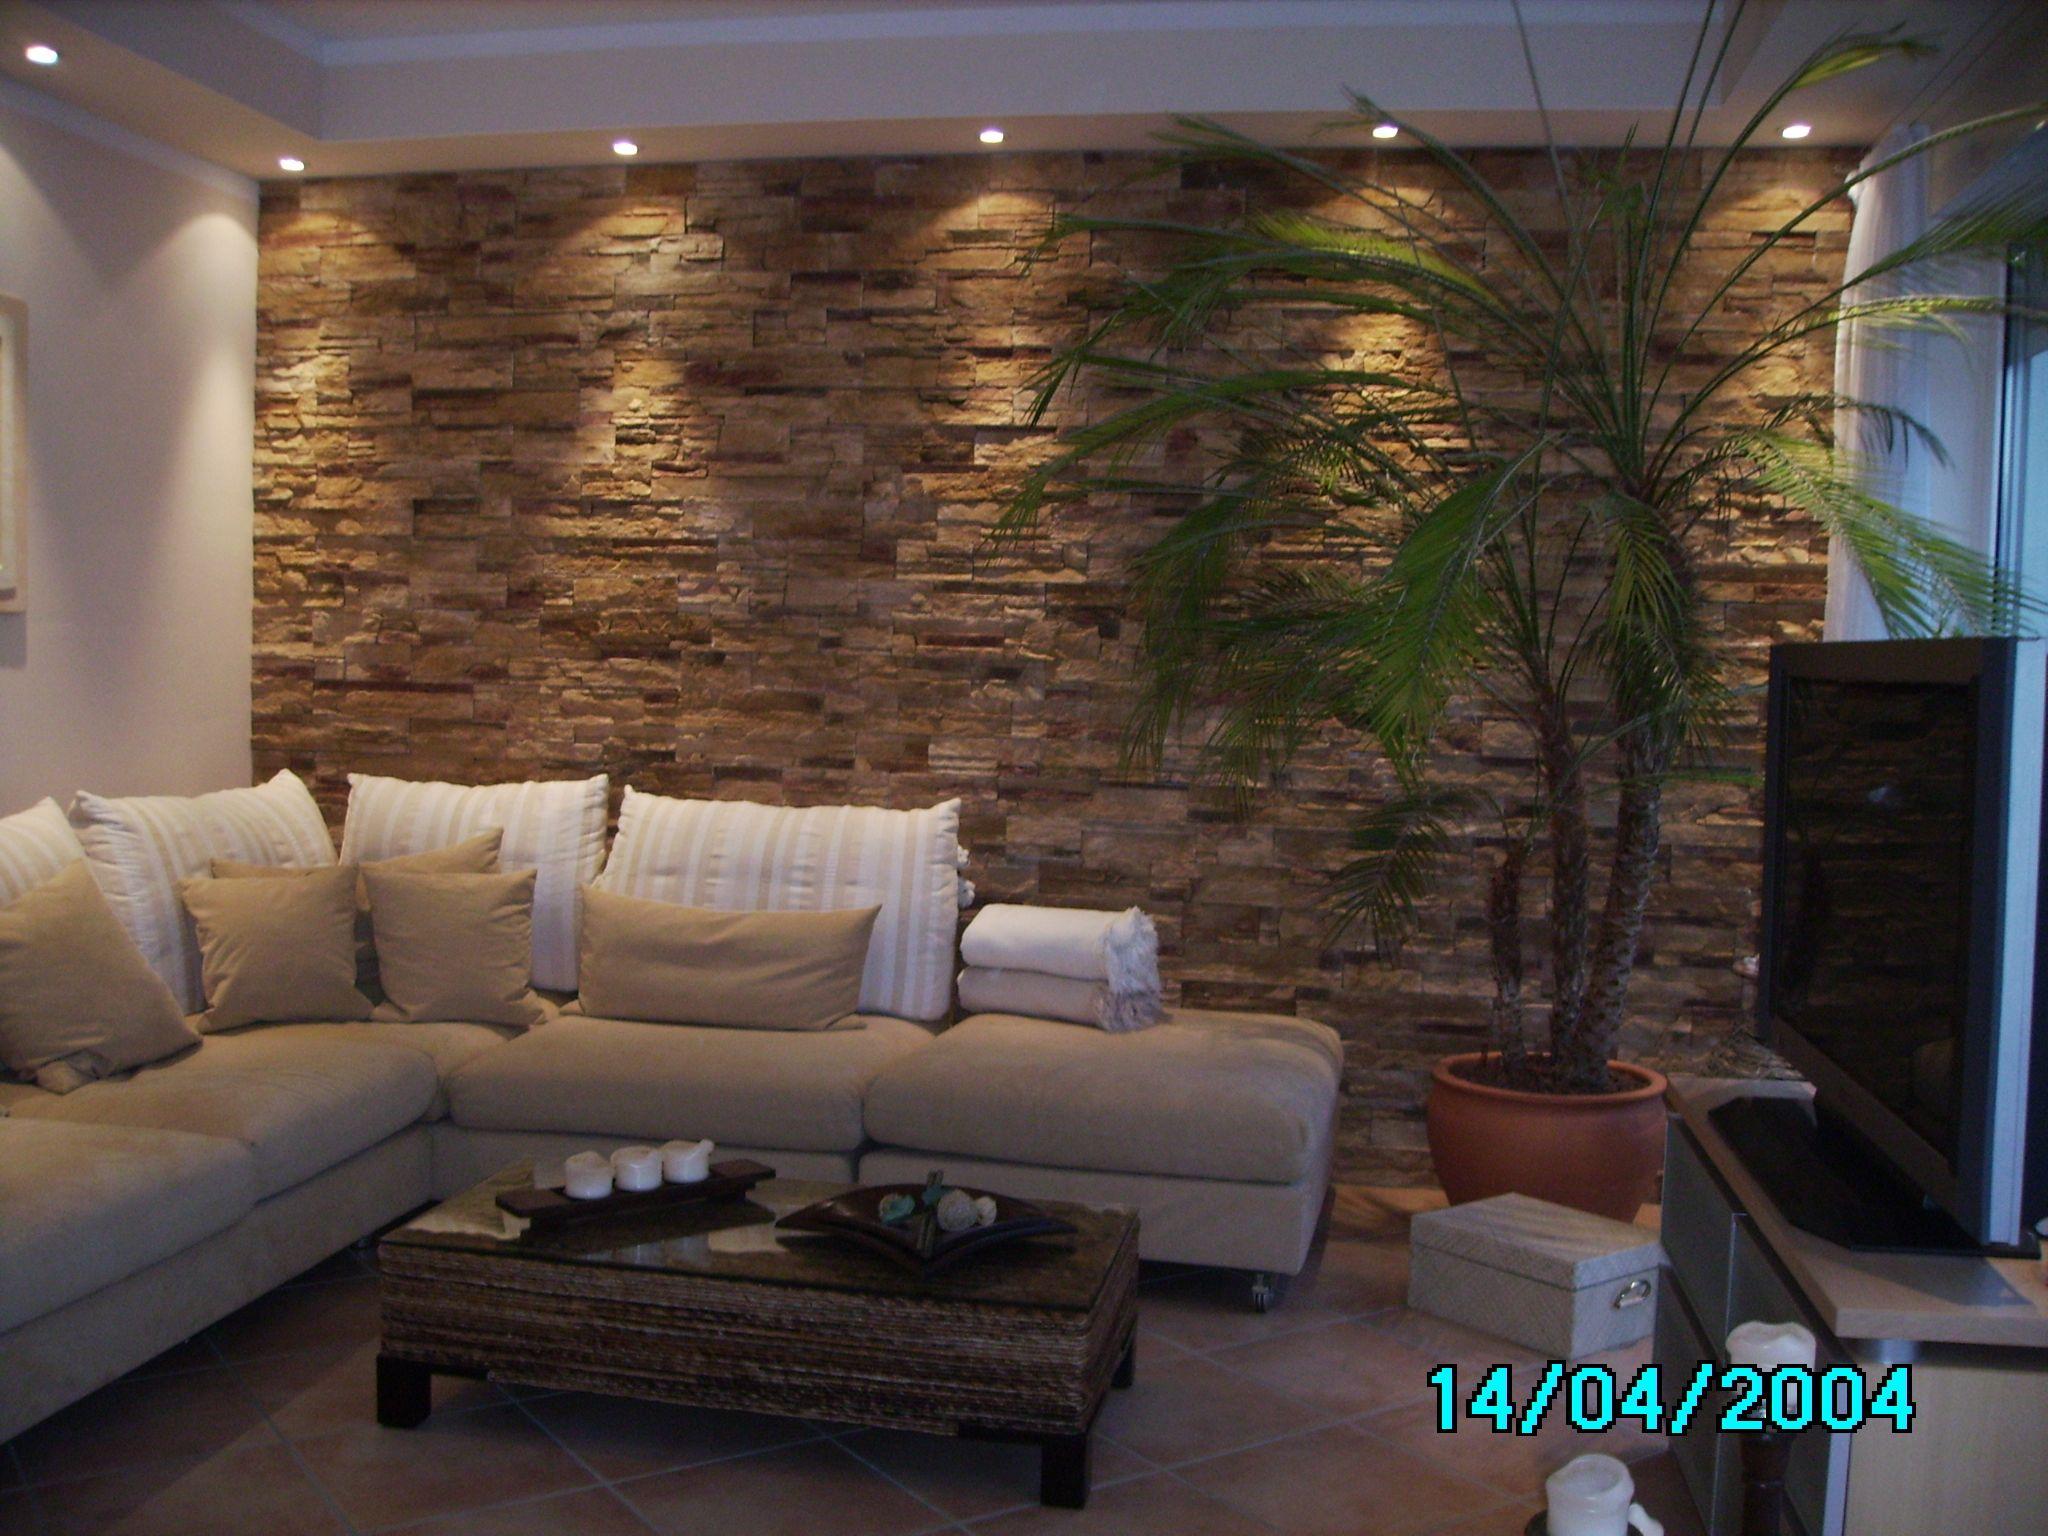 steinwand-dundee-wohnzimmer-4.jpg 2,048×1,536 píxeles | Gf ...